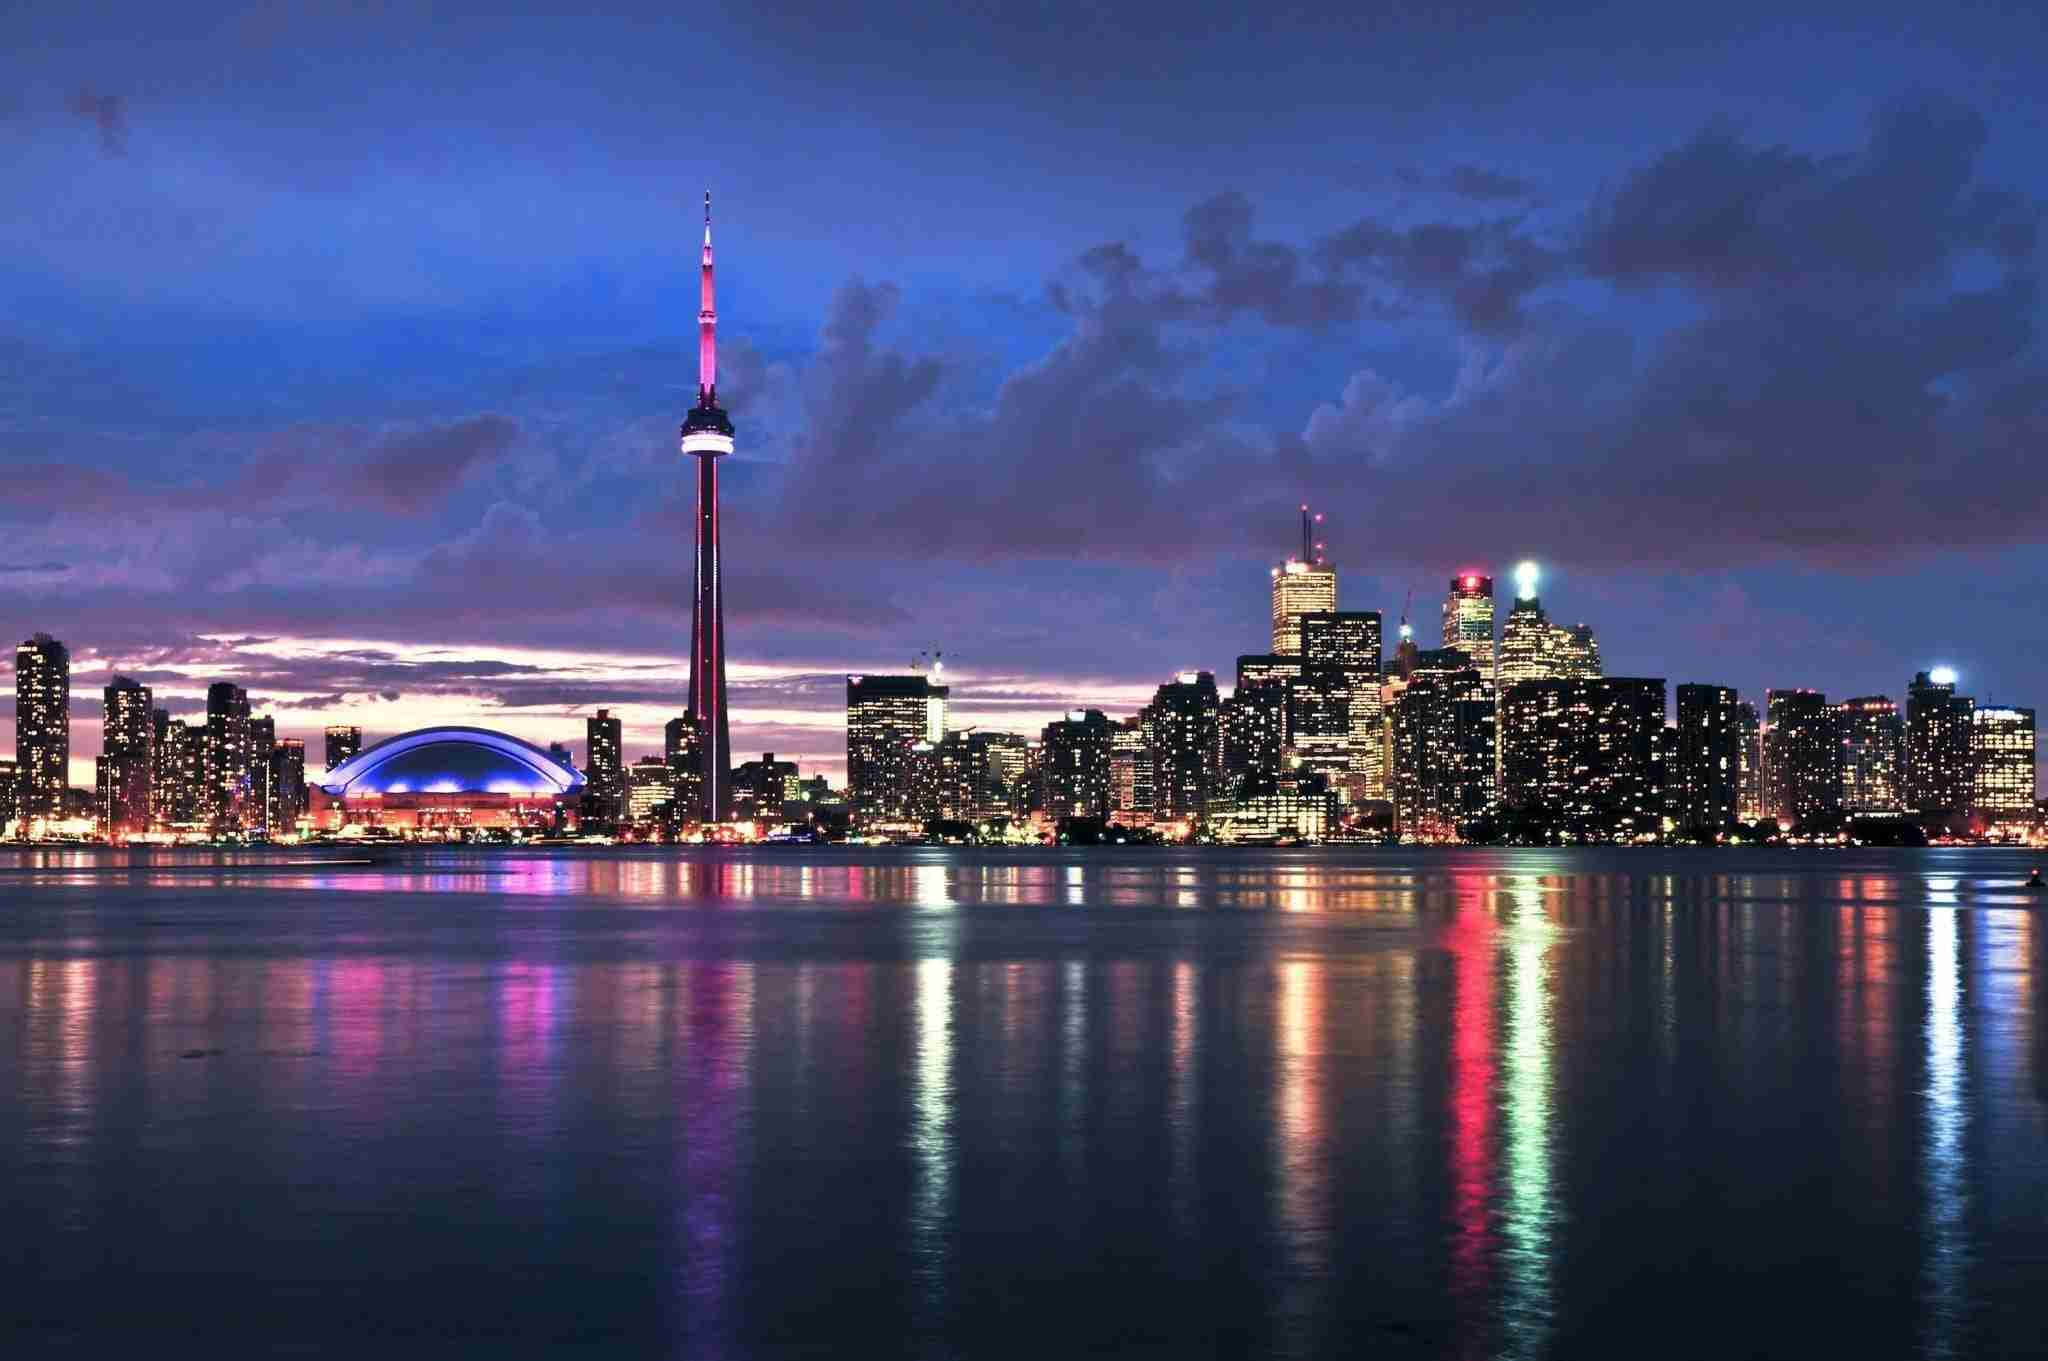 Toronto Real Estate Sales Decline 16% in 2018